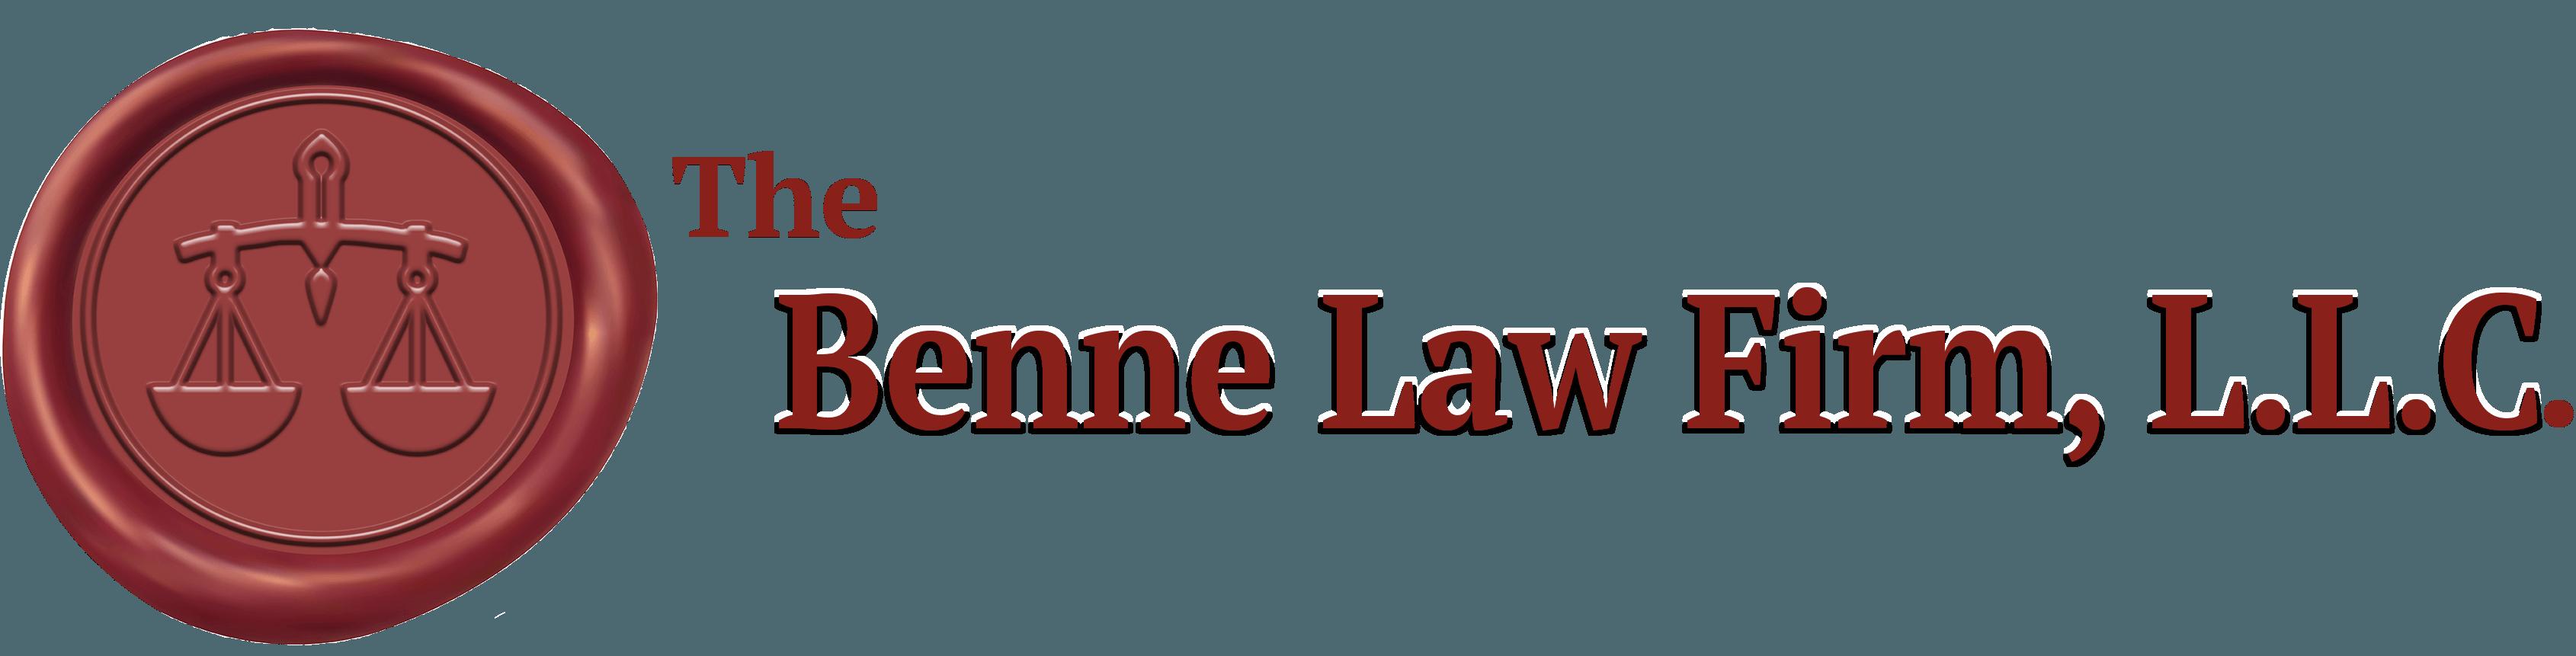 Benne Law